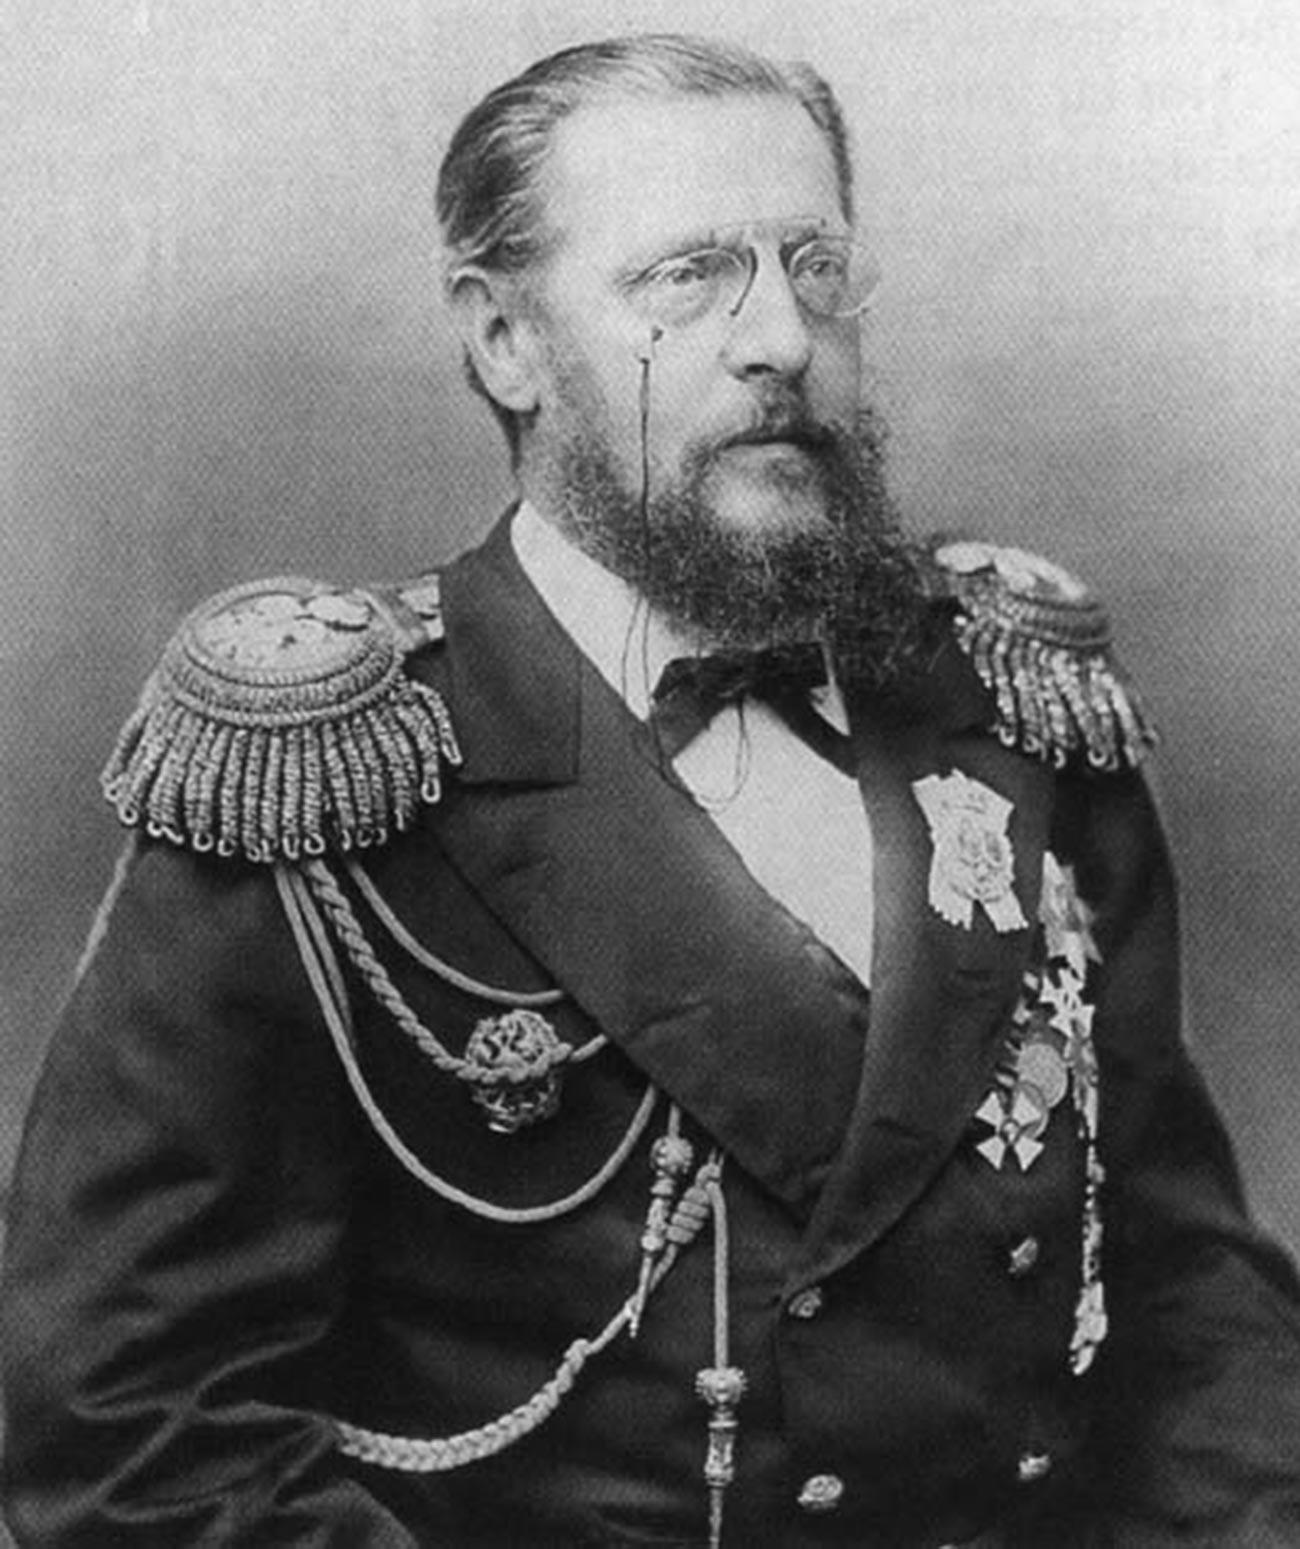 Grand Duke Konstantin Nikolaevich, Nicholas's father